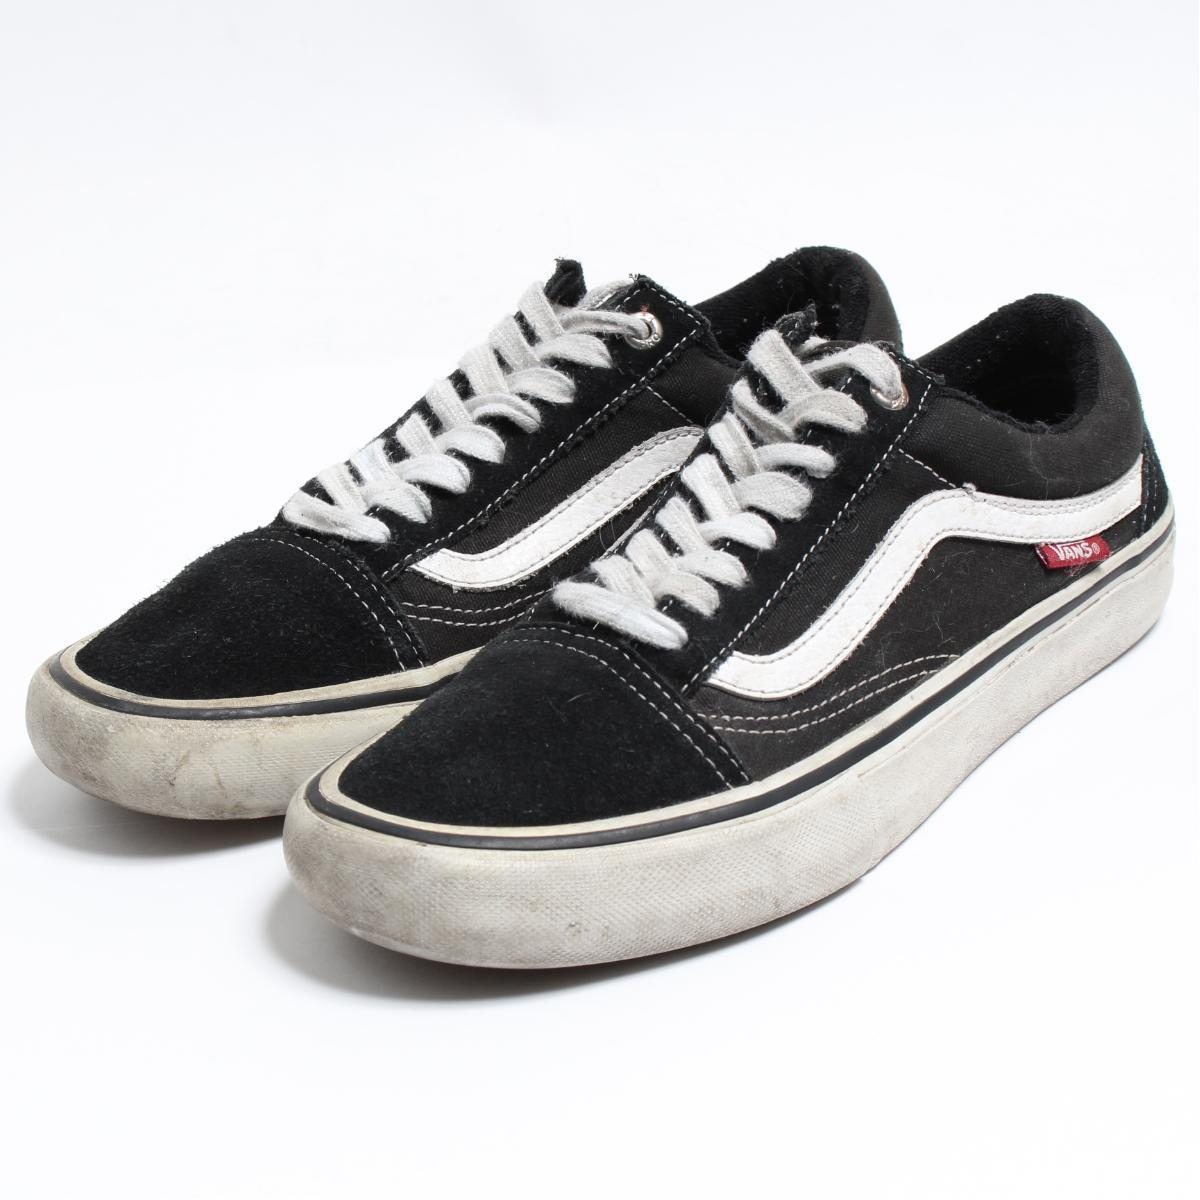 Vans VANS OLD SKOOL PRO old school pro ULTRA CUSH sneakers US6.5 Lady s  24.5cm  bon4540 627f8c08c3